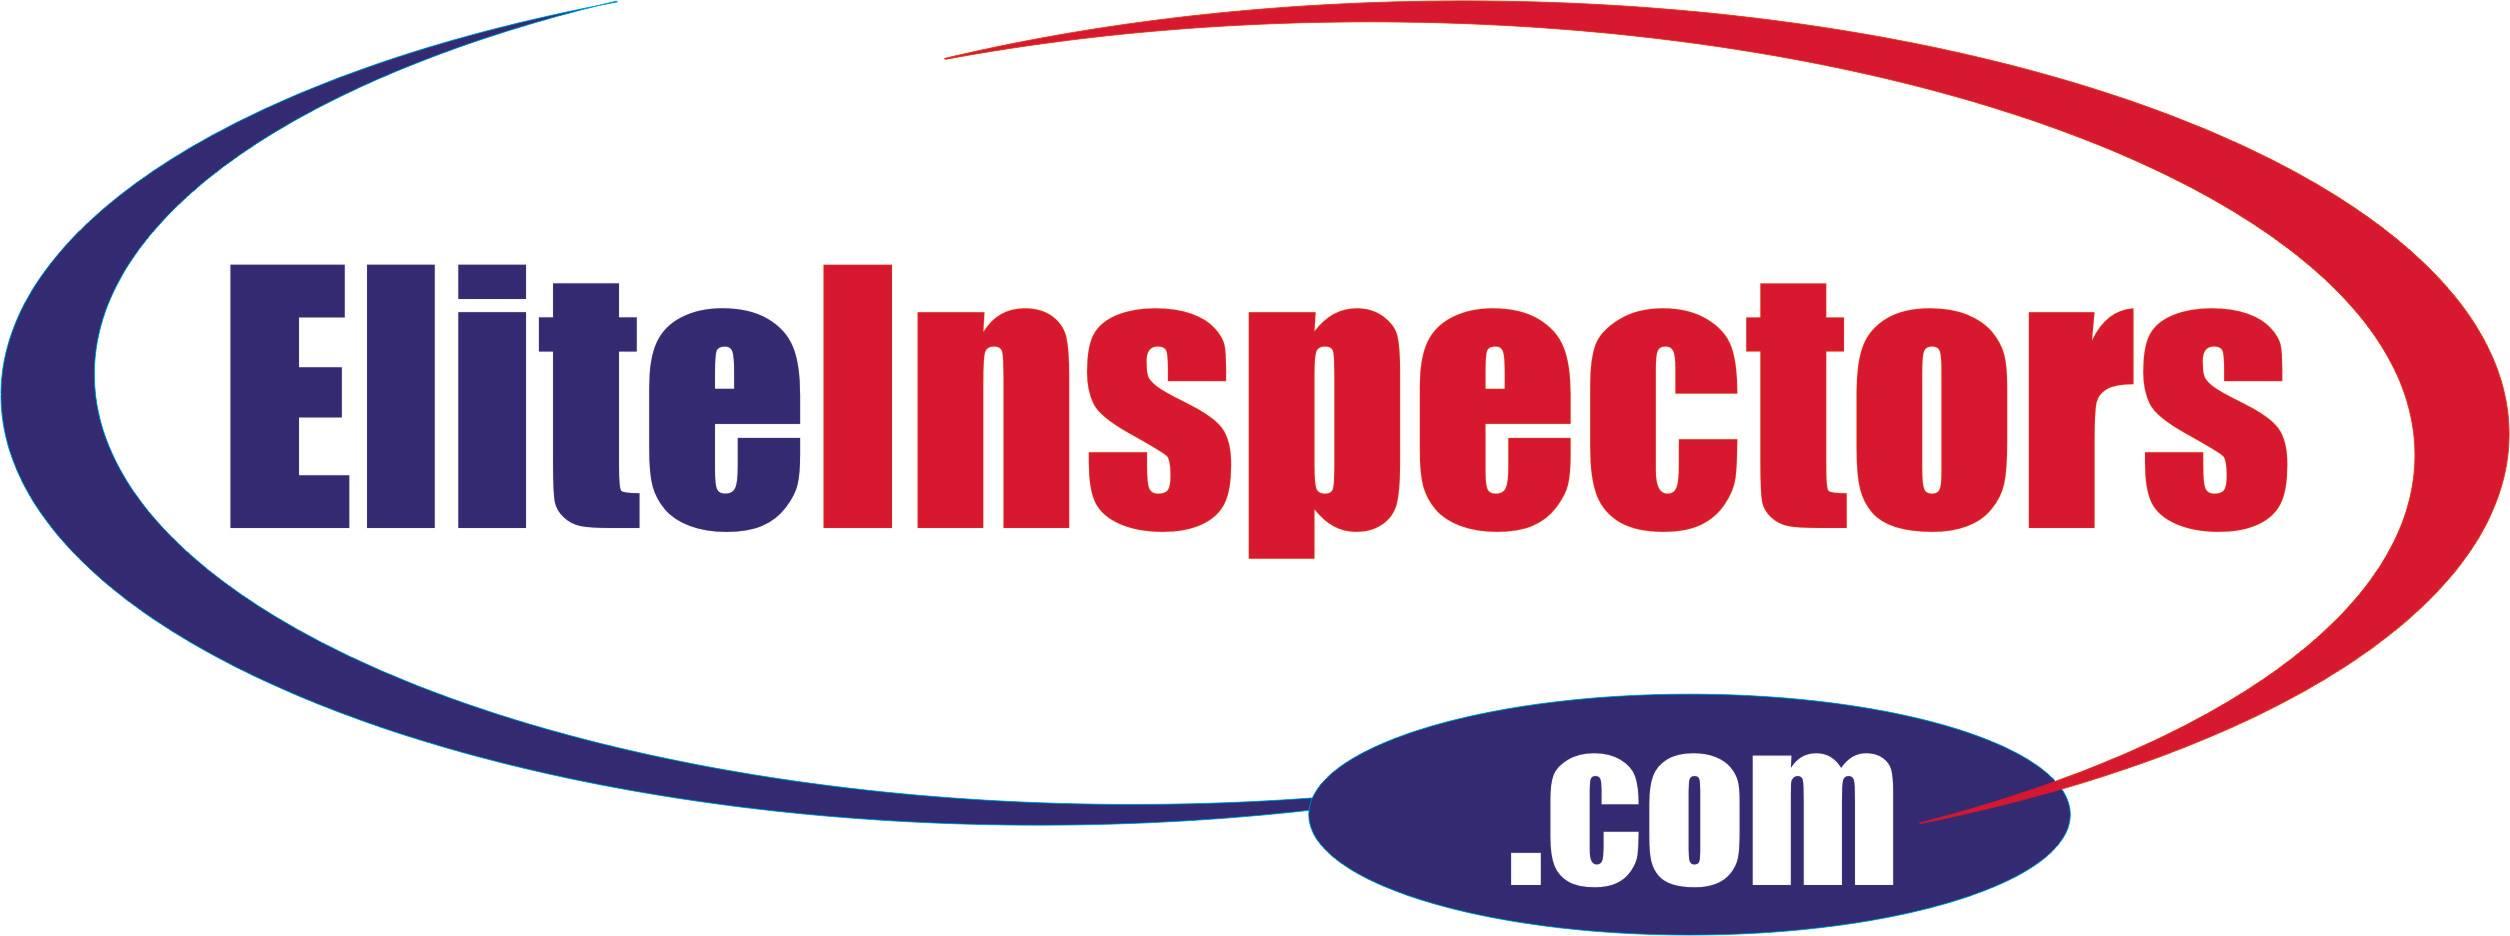 4 Point Inspections Jacksonville Fl Elite Inspectors Llc